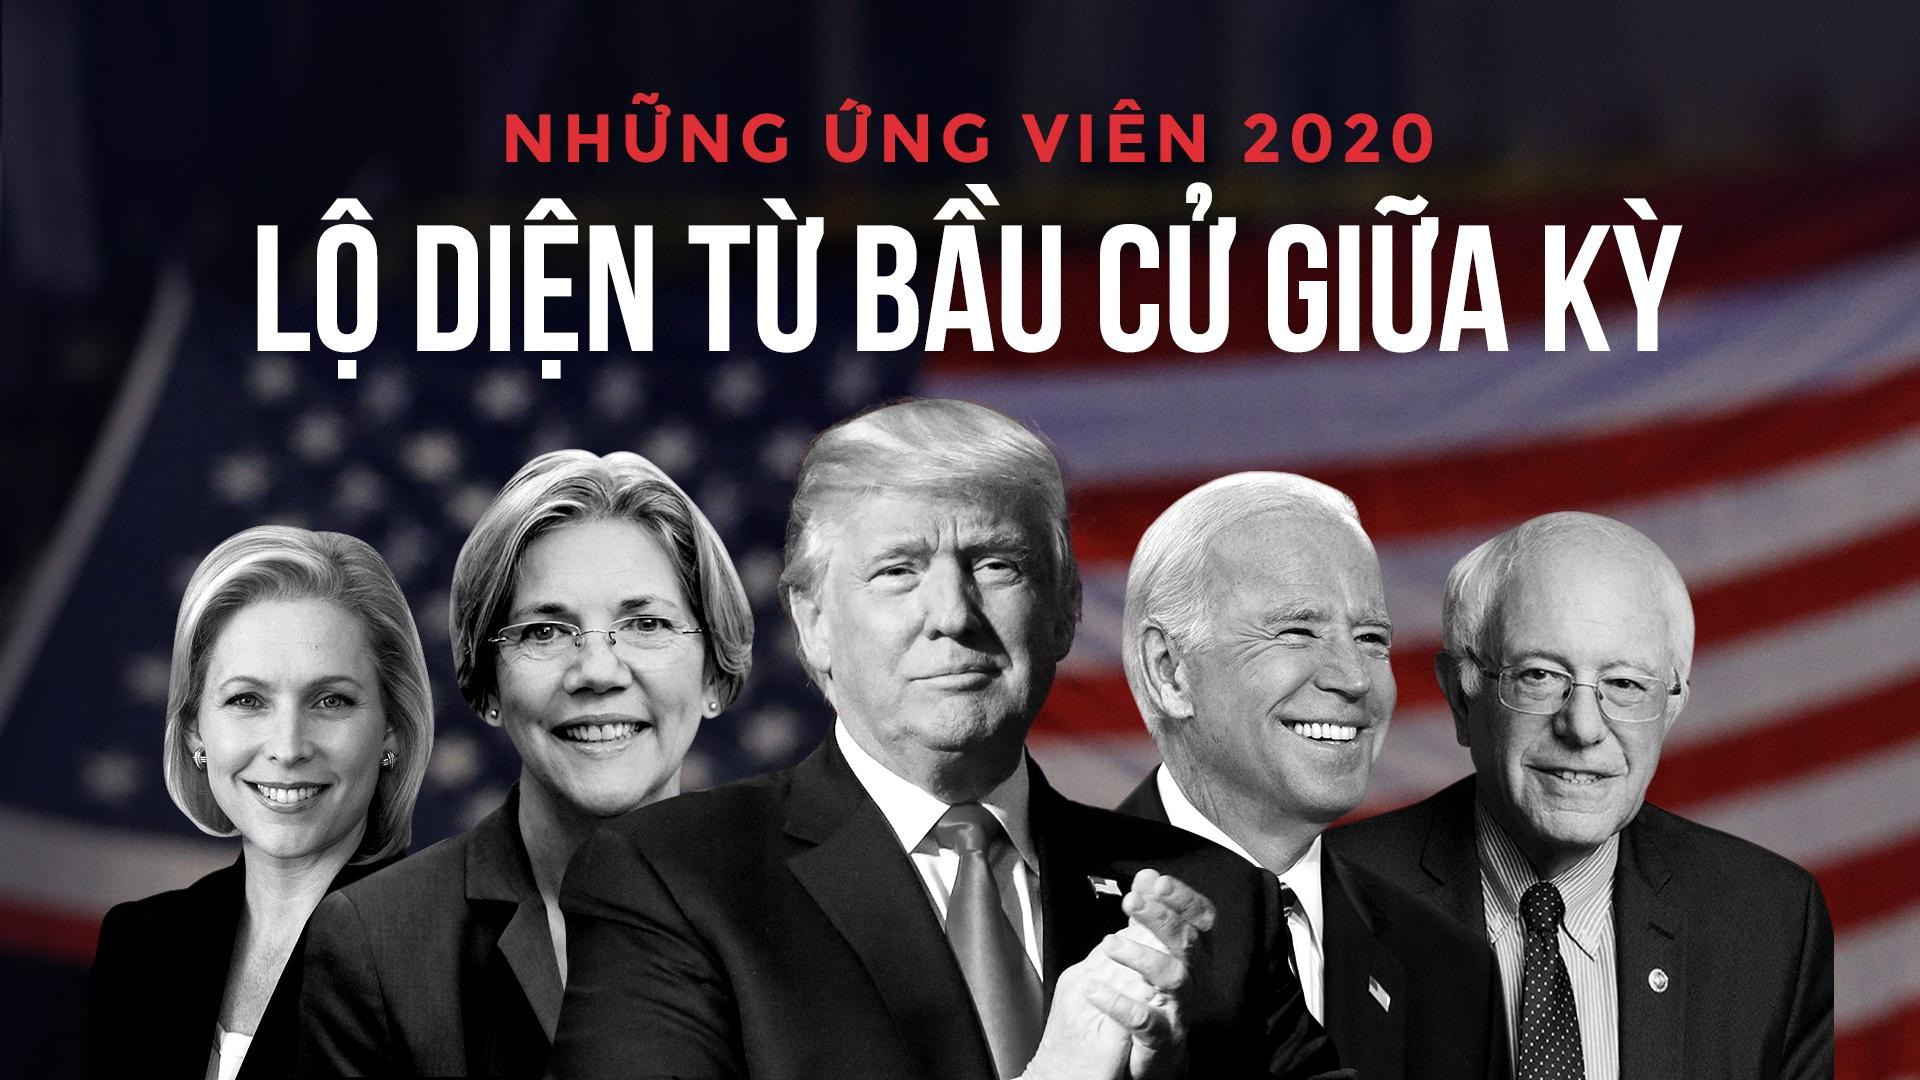 Nhung ung vien 2020 lo dien o bau cu giua ky My hinh anh 2